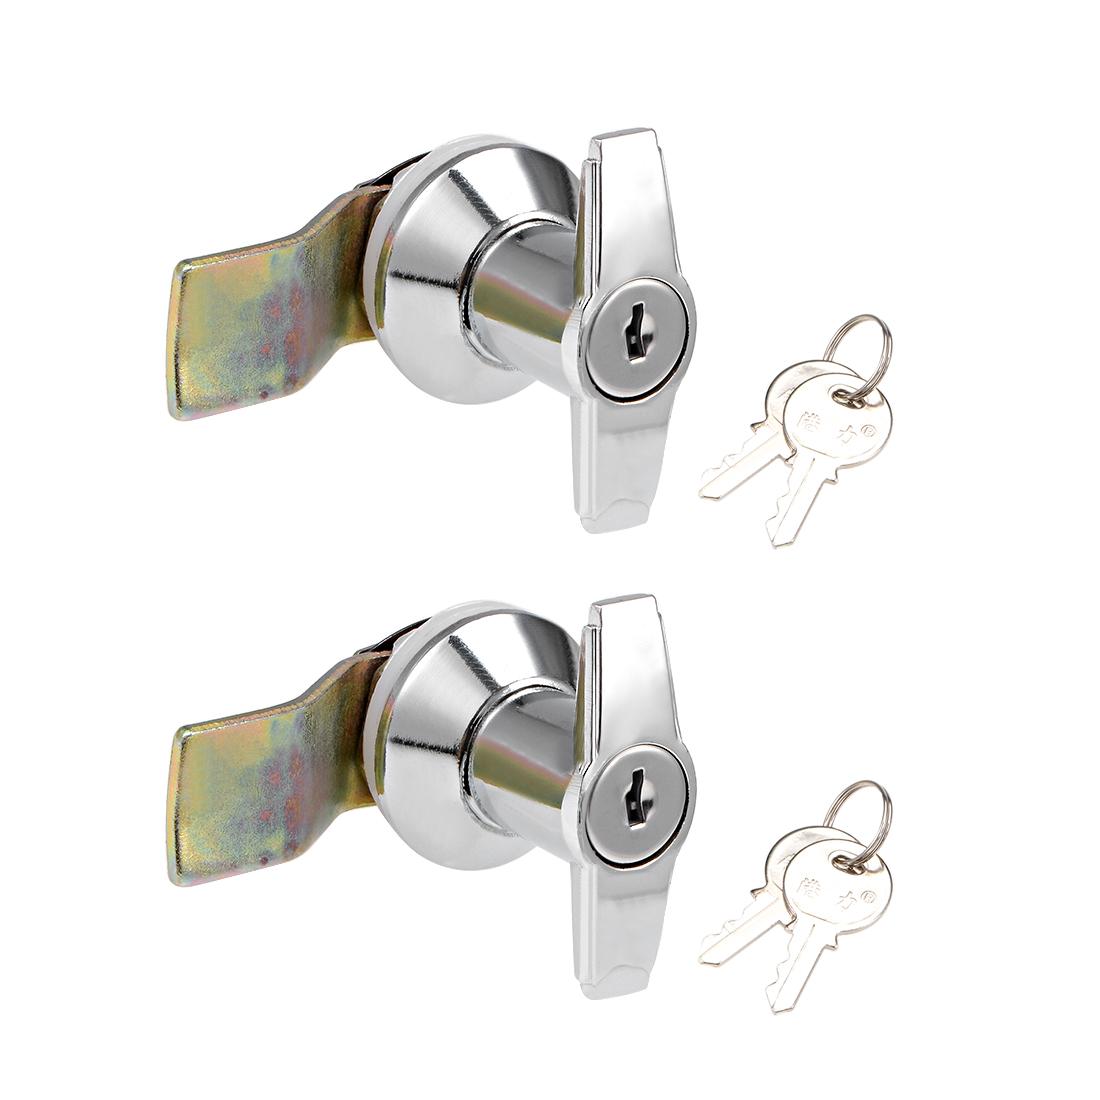 T-Handle Cam Locking Latch Keyed Shell Lock Zinc Alloy Chrome Plated 2Pcs